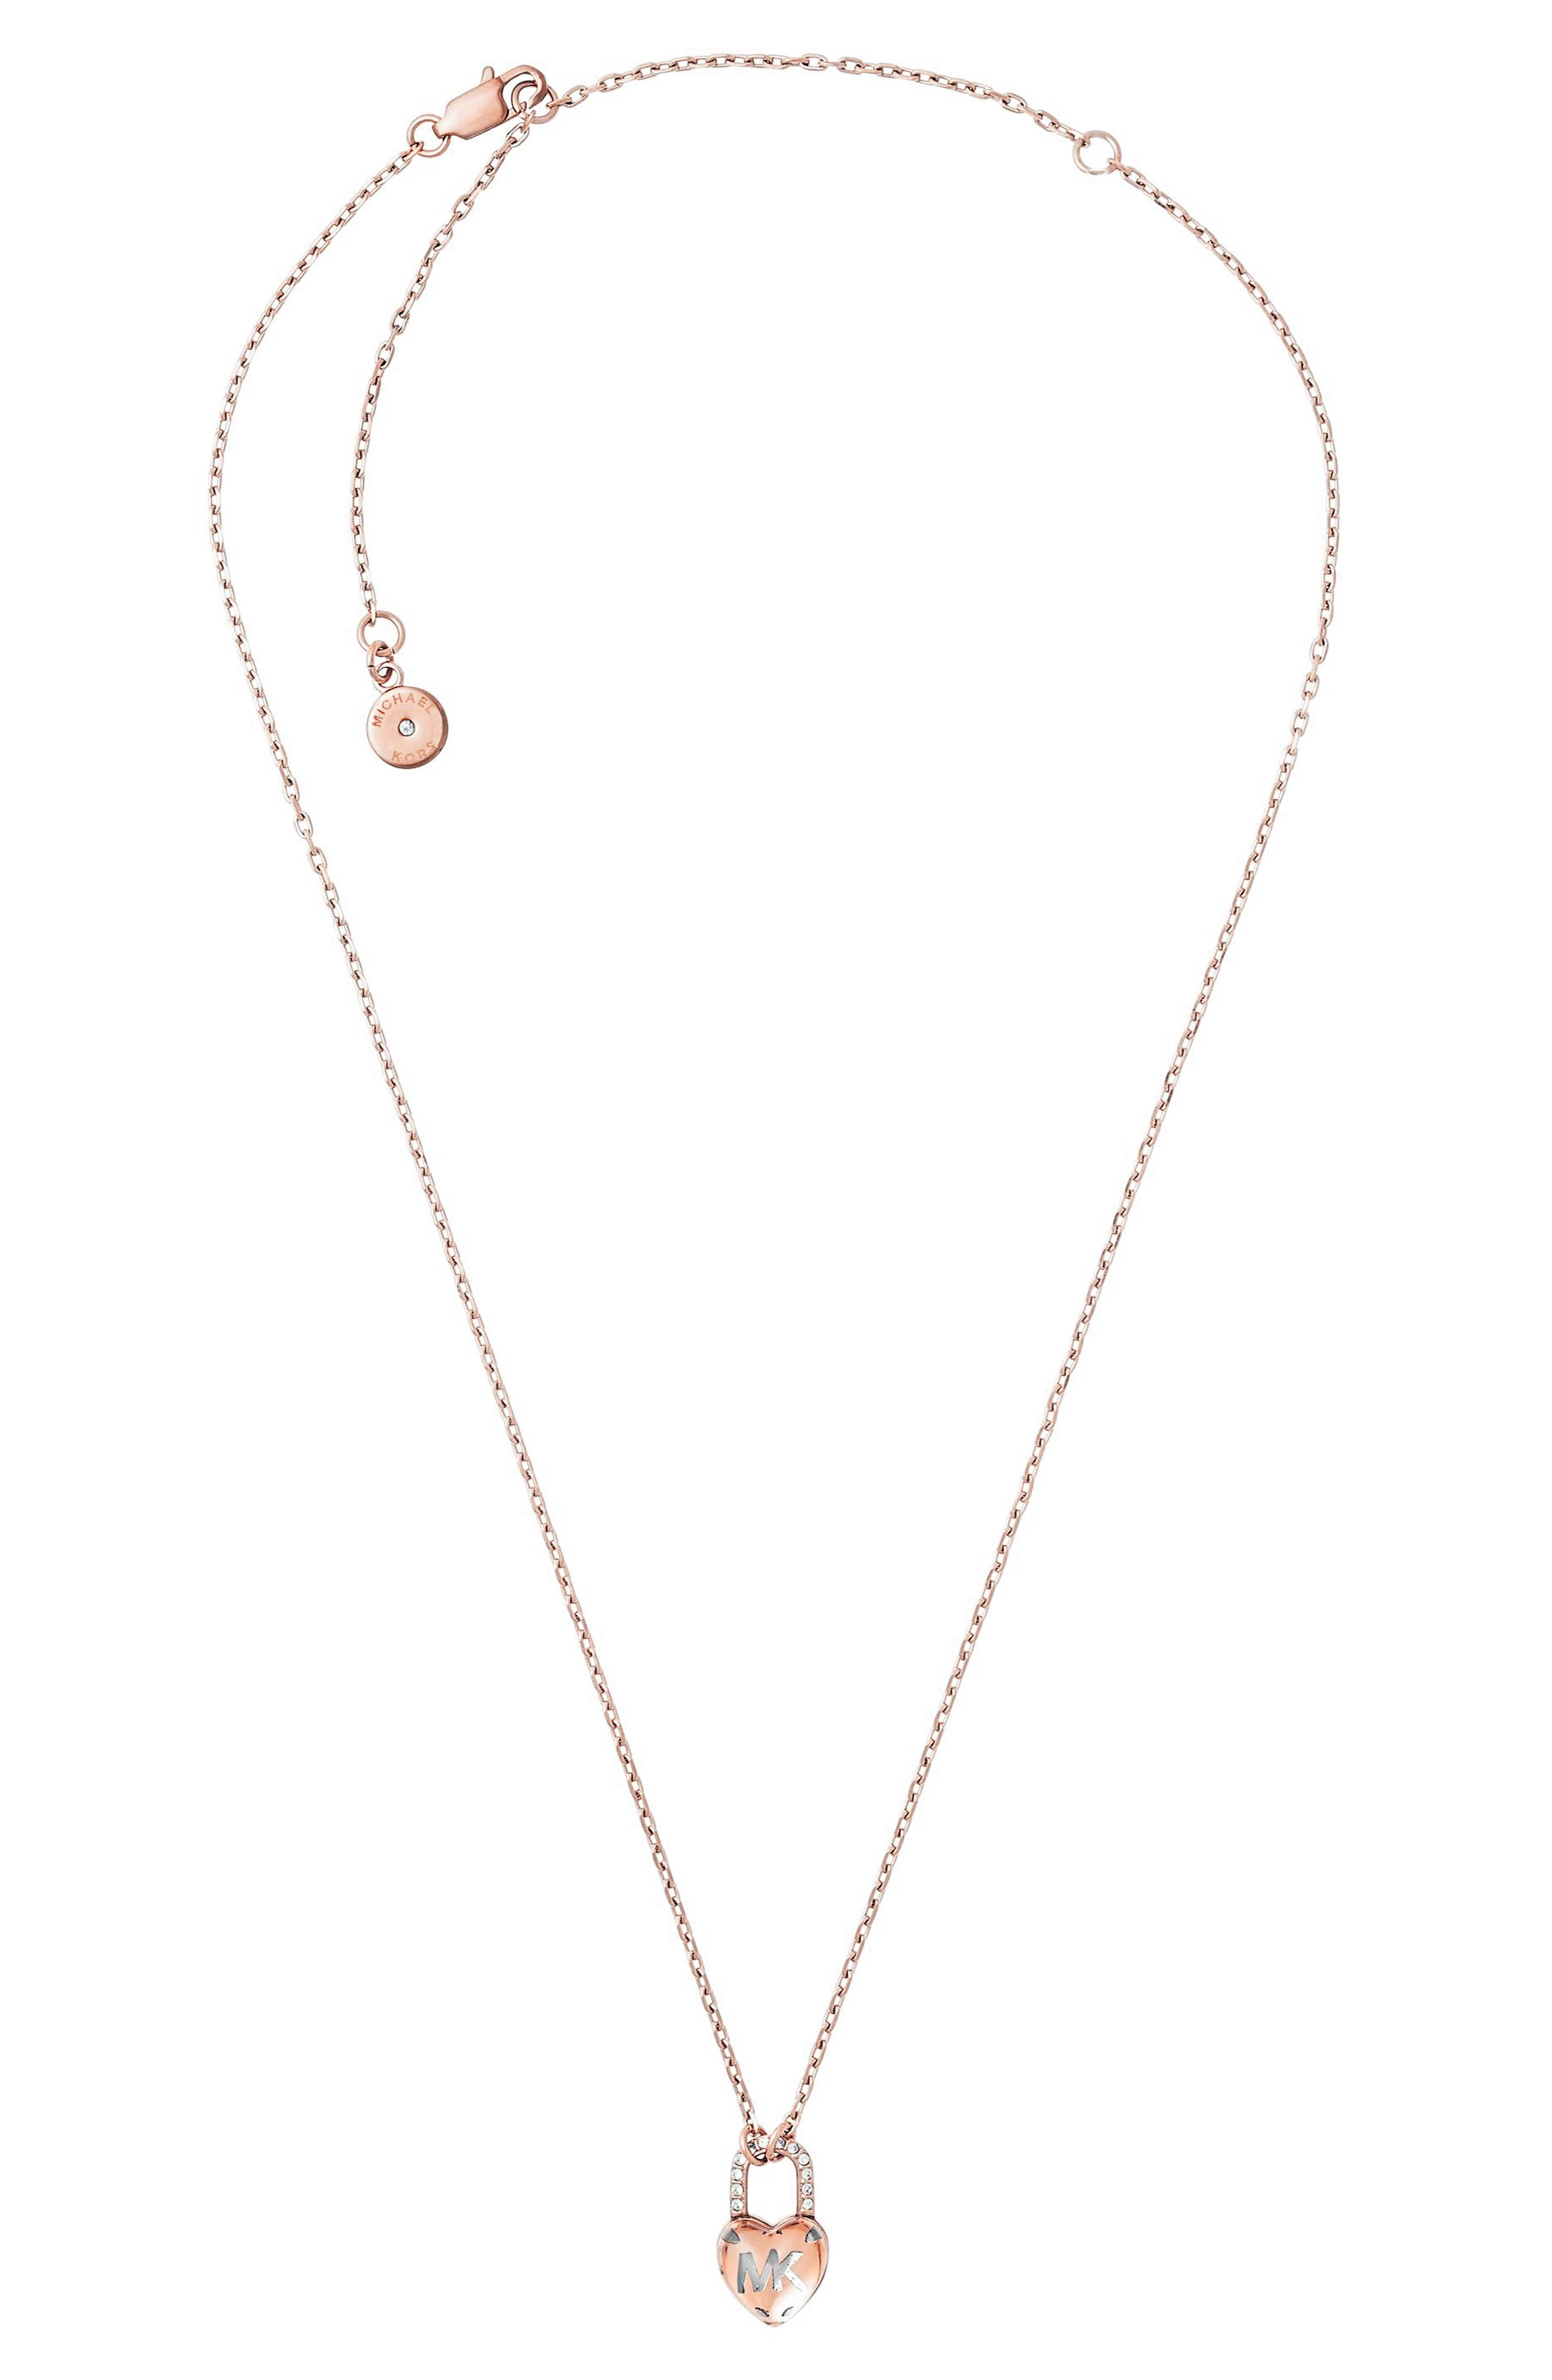 Michael Kors Heart Padlock Pendant Necklace